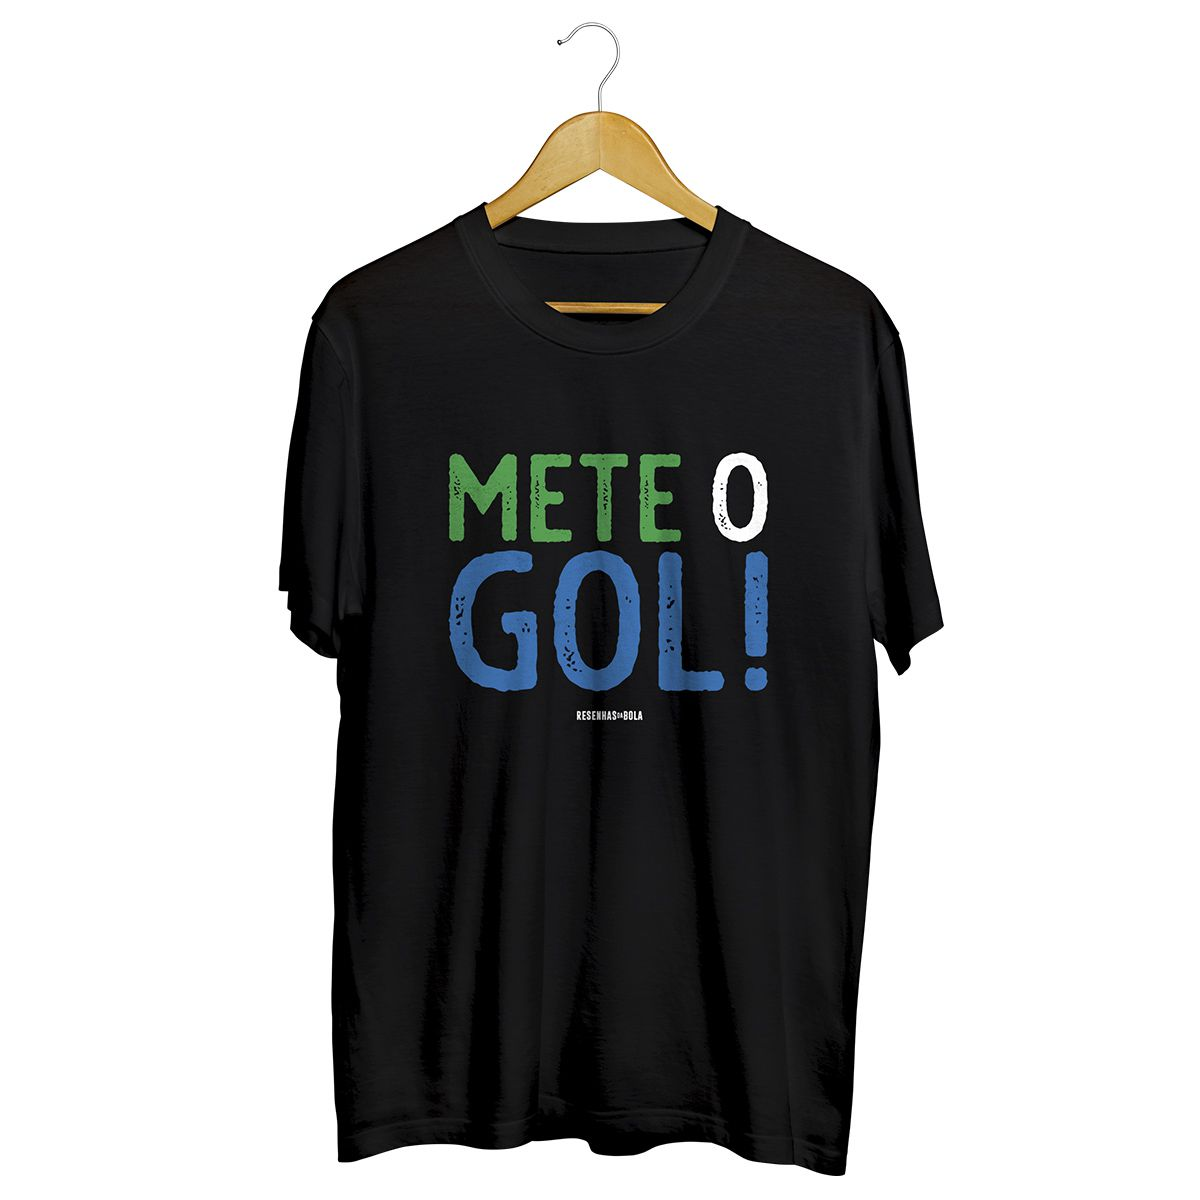 Camiseta - METE O GOL. Masculino